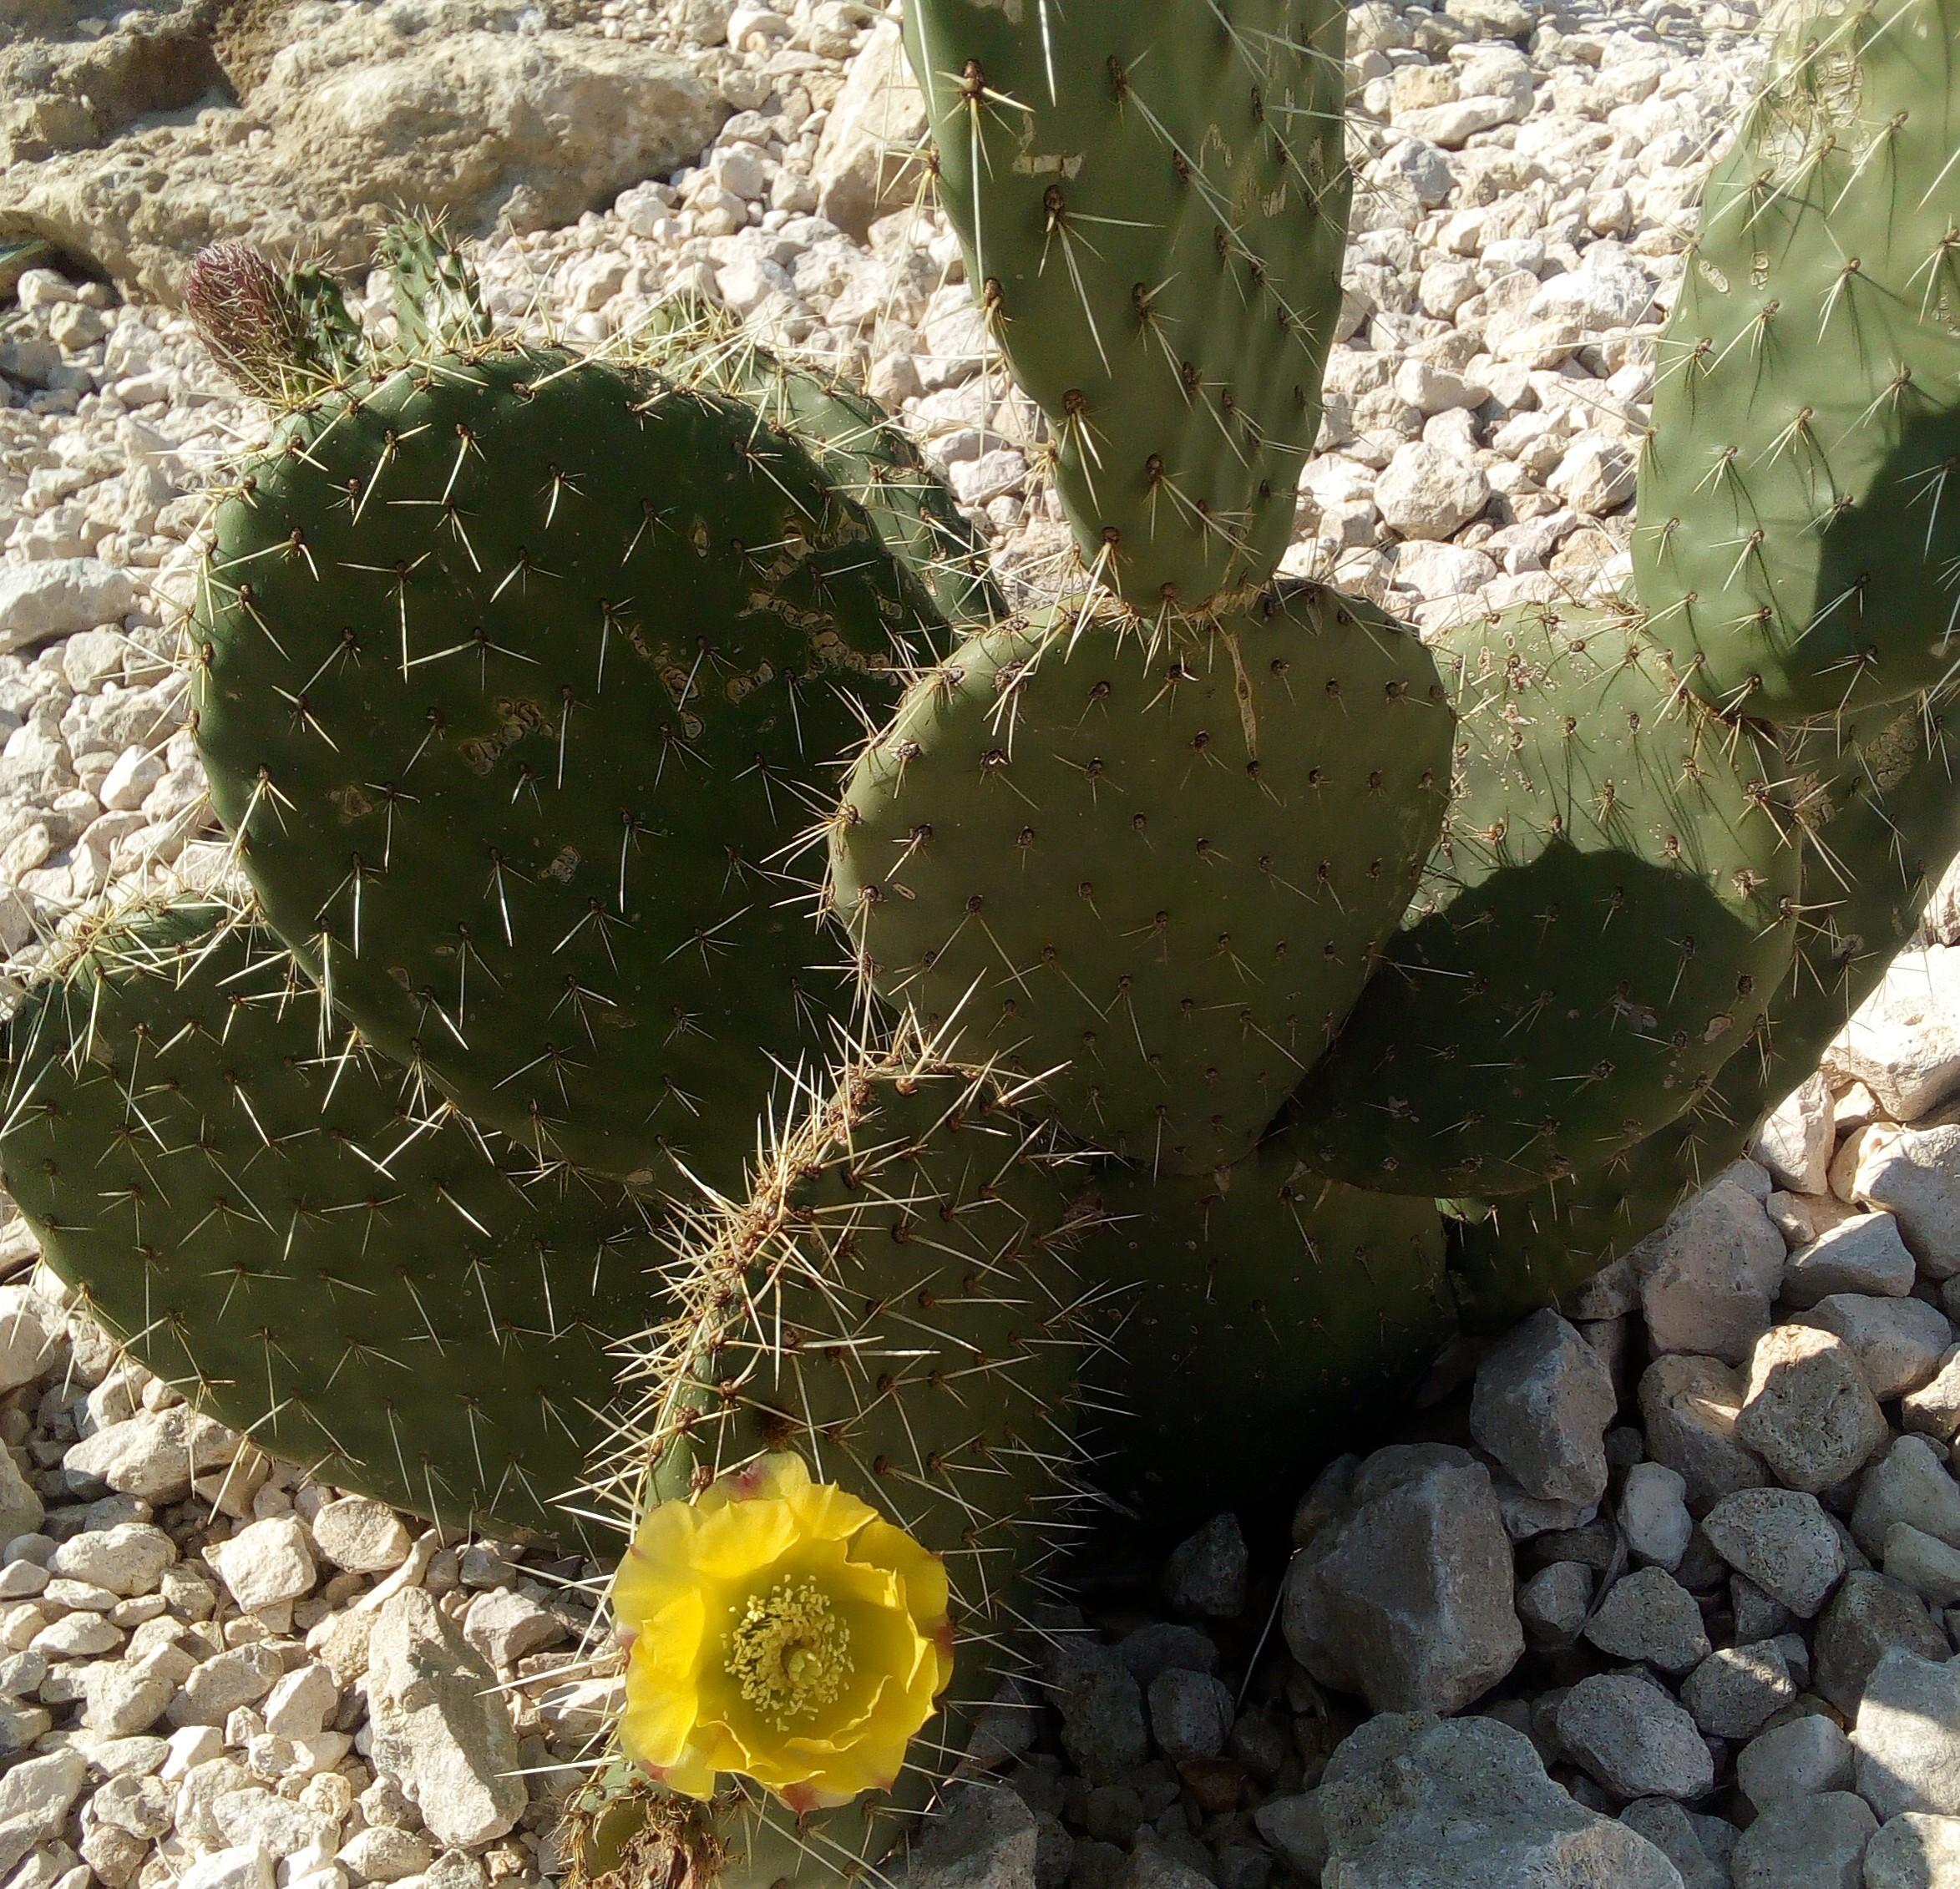 cactus en fleur jaune